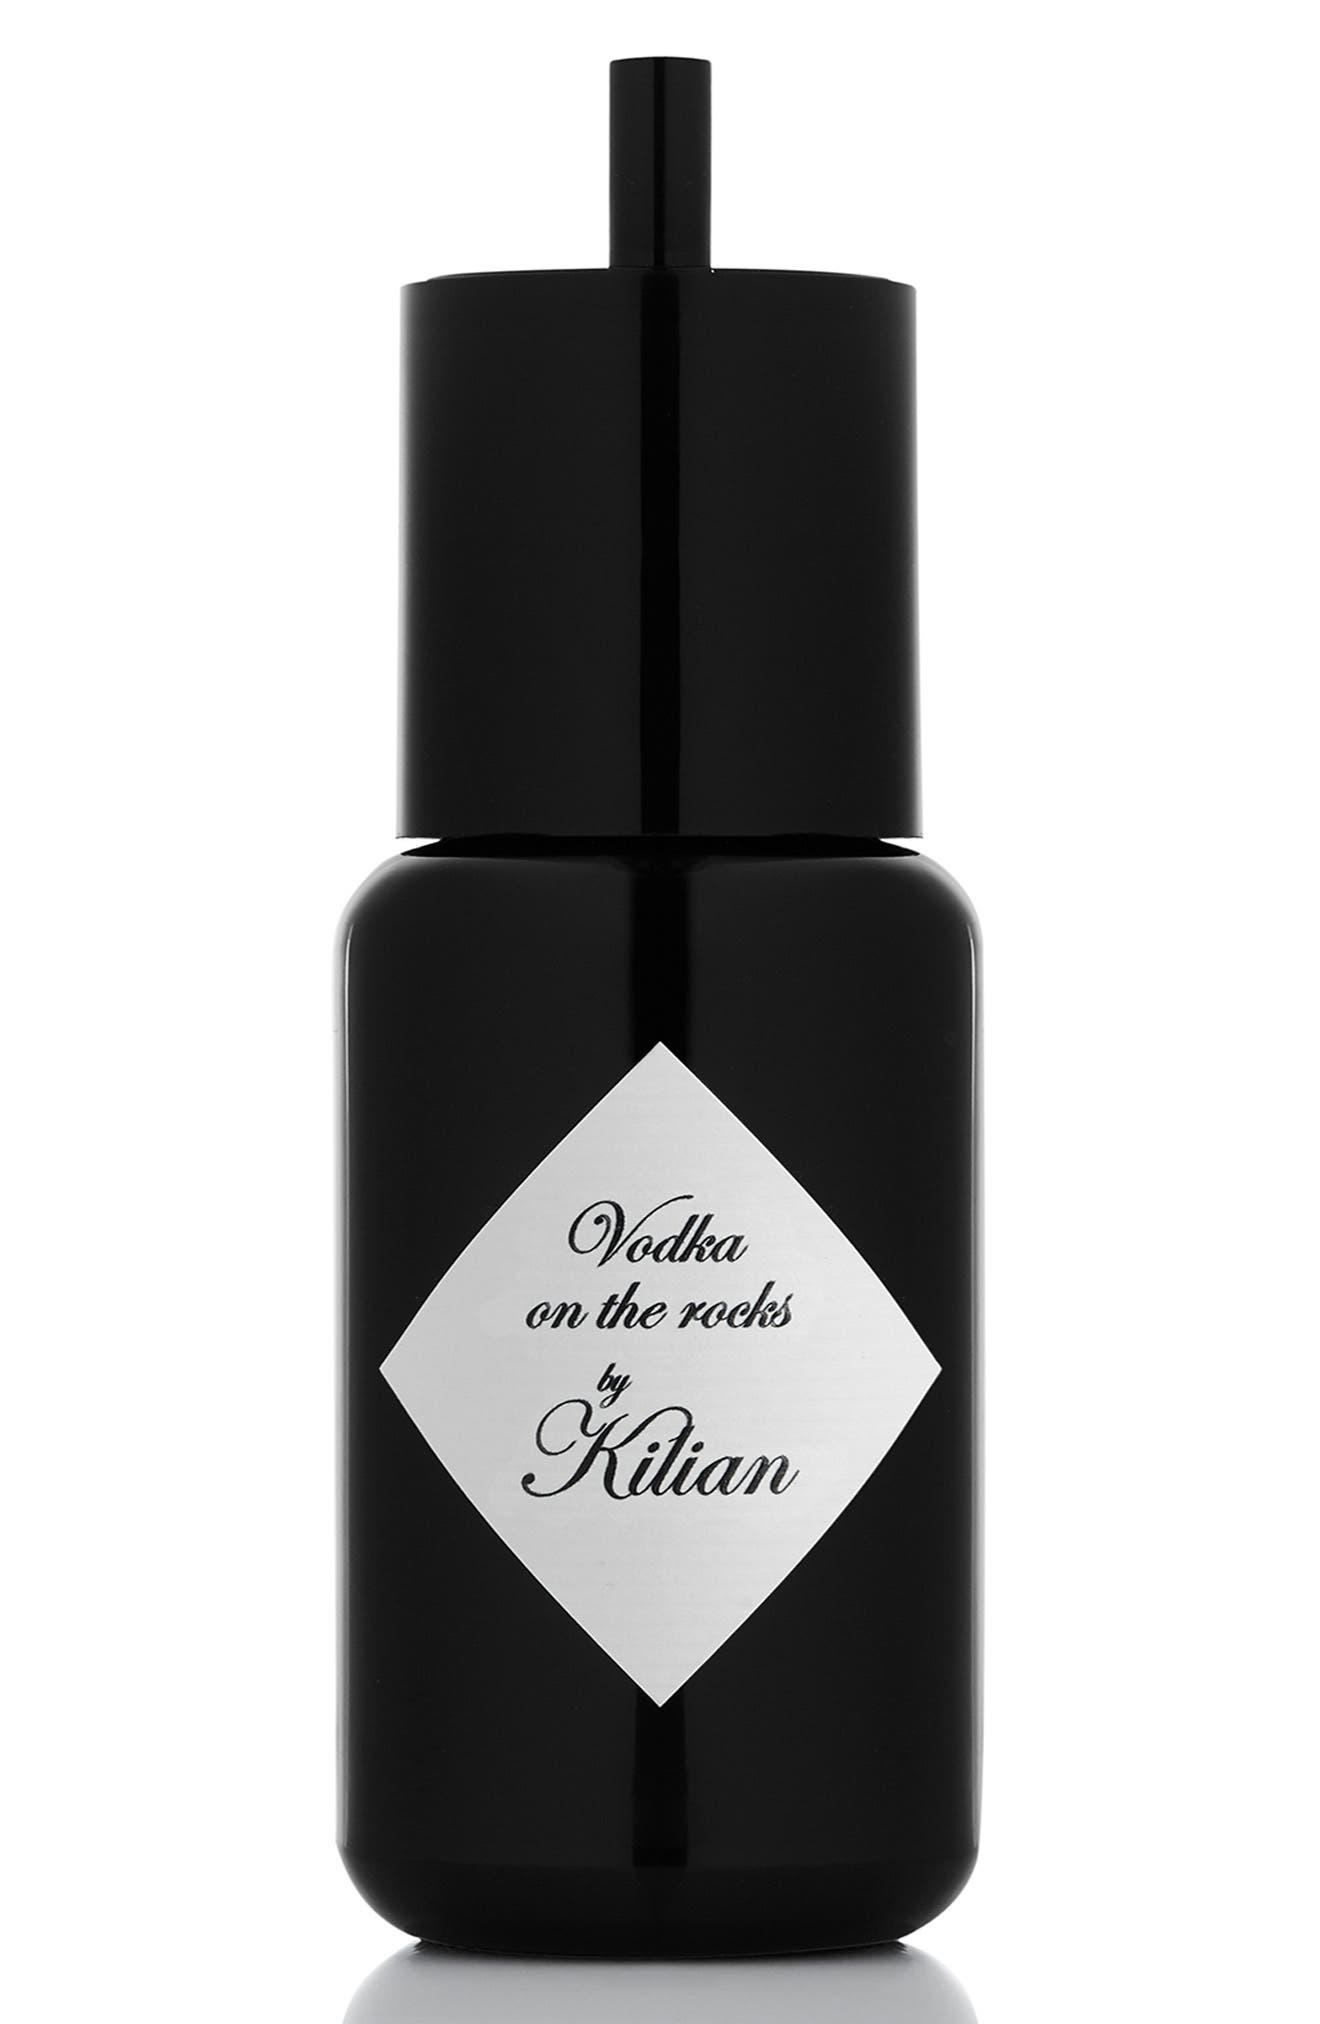 By Kilian Vodka On The Rocks Fragrance Refill